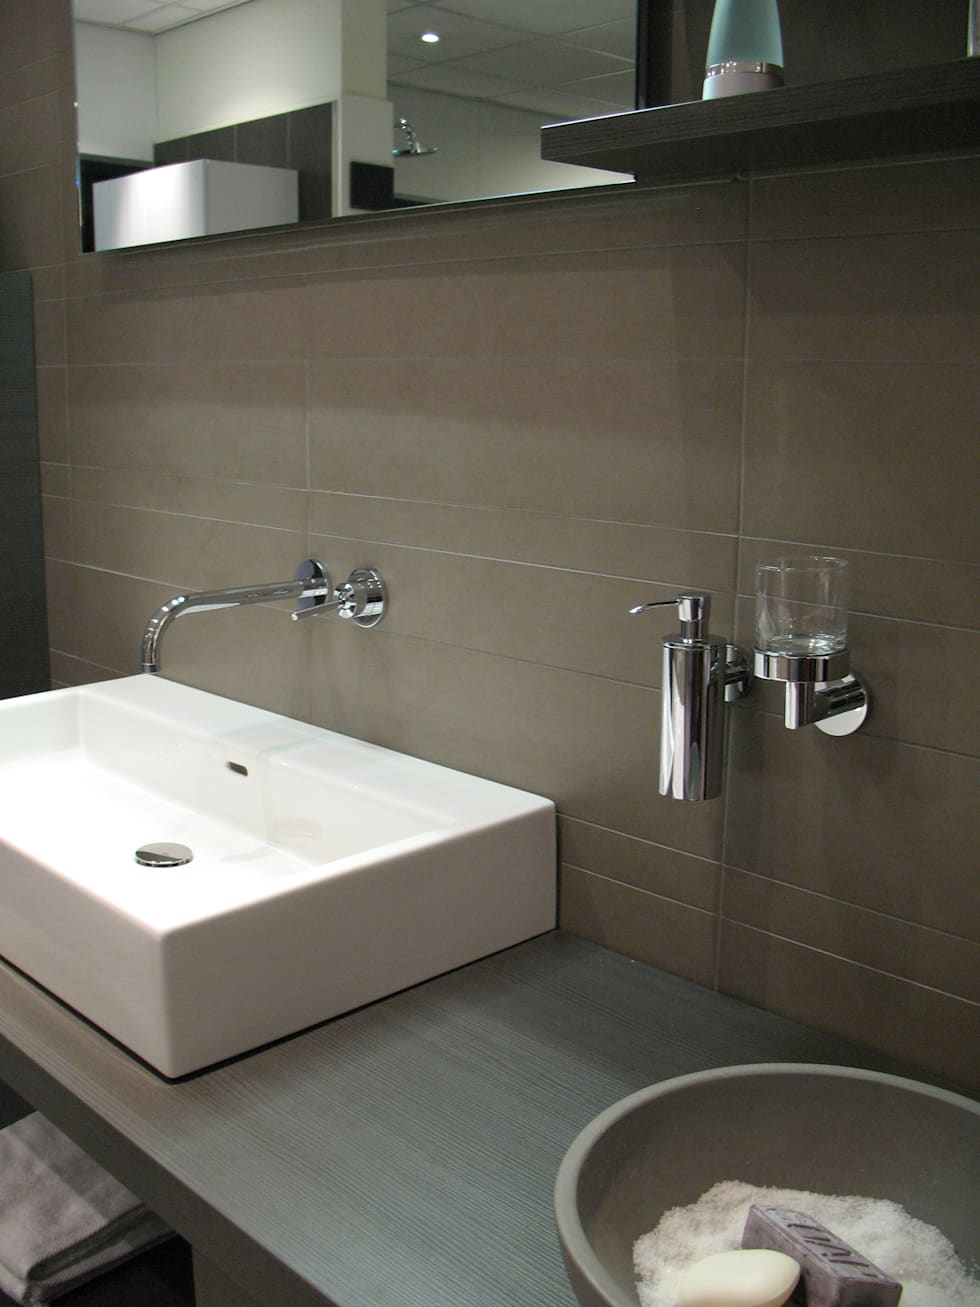 Am badkamers: modern tarz banyo | homify